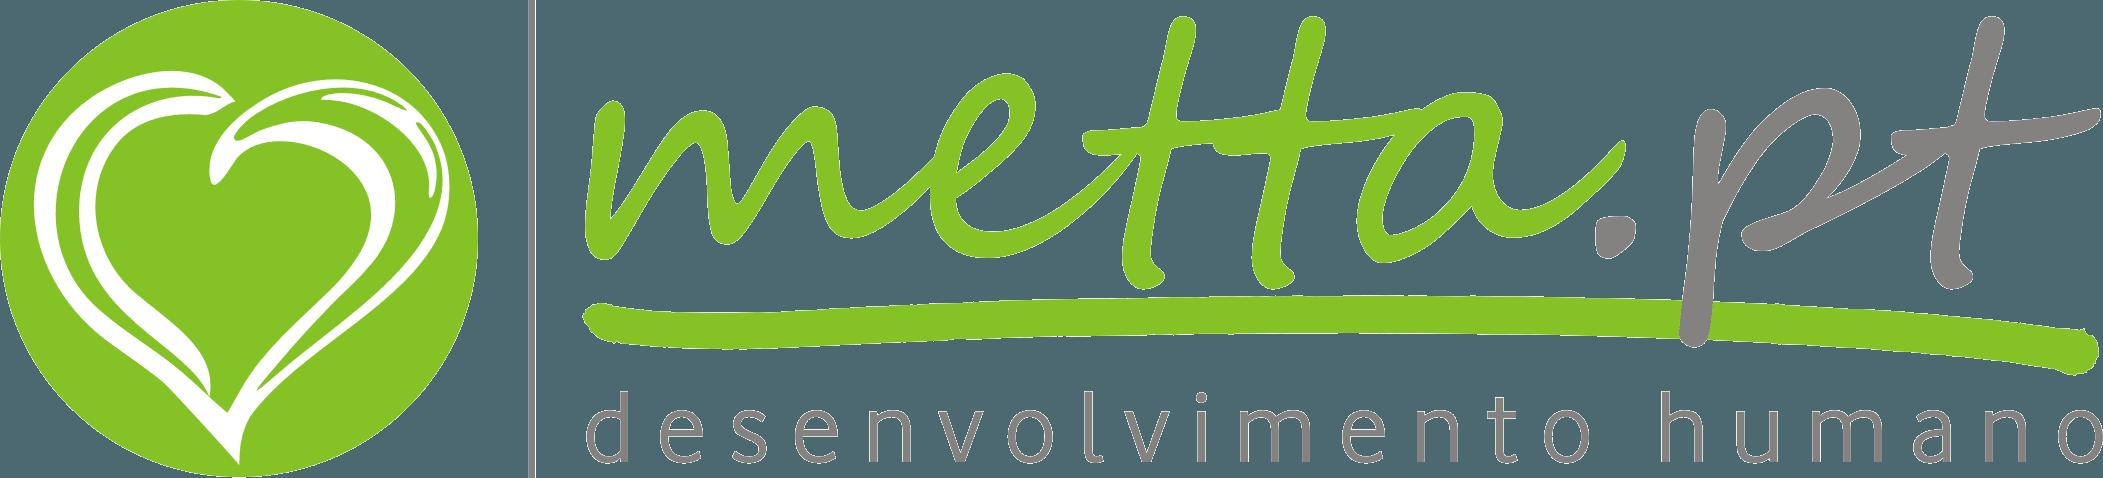 metta.pt | desenvolvimento humano